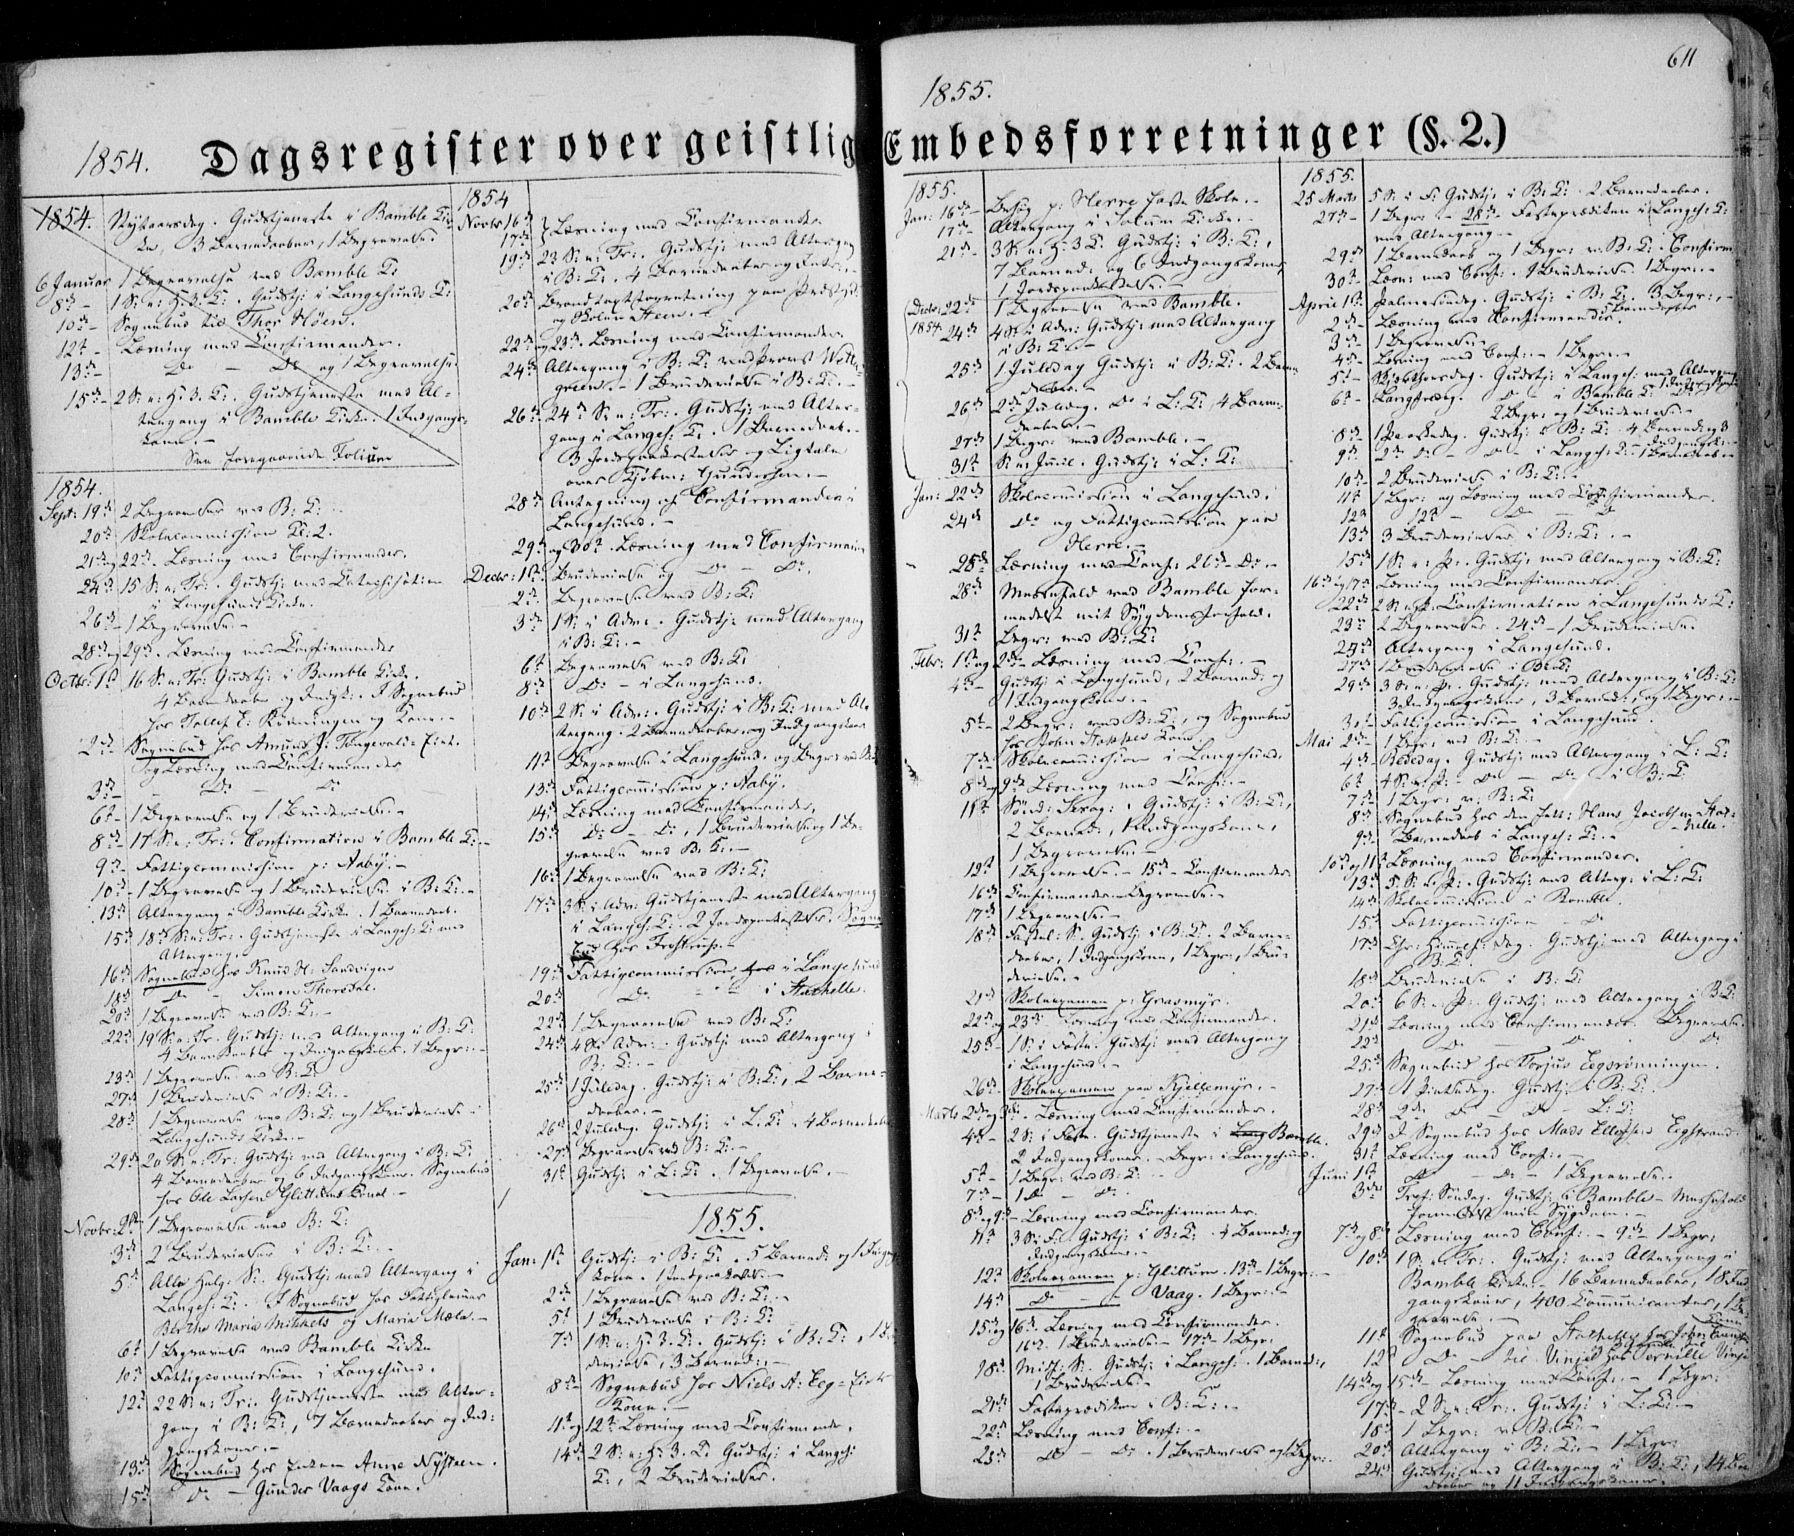 SAKO, Bamble kirkebøker, F/Fa/L0005: Ministerialbok nr. I 5, 1854-1869, s. 611